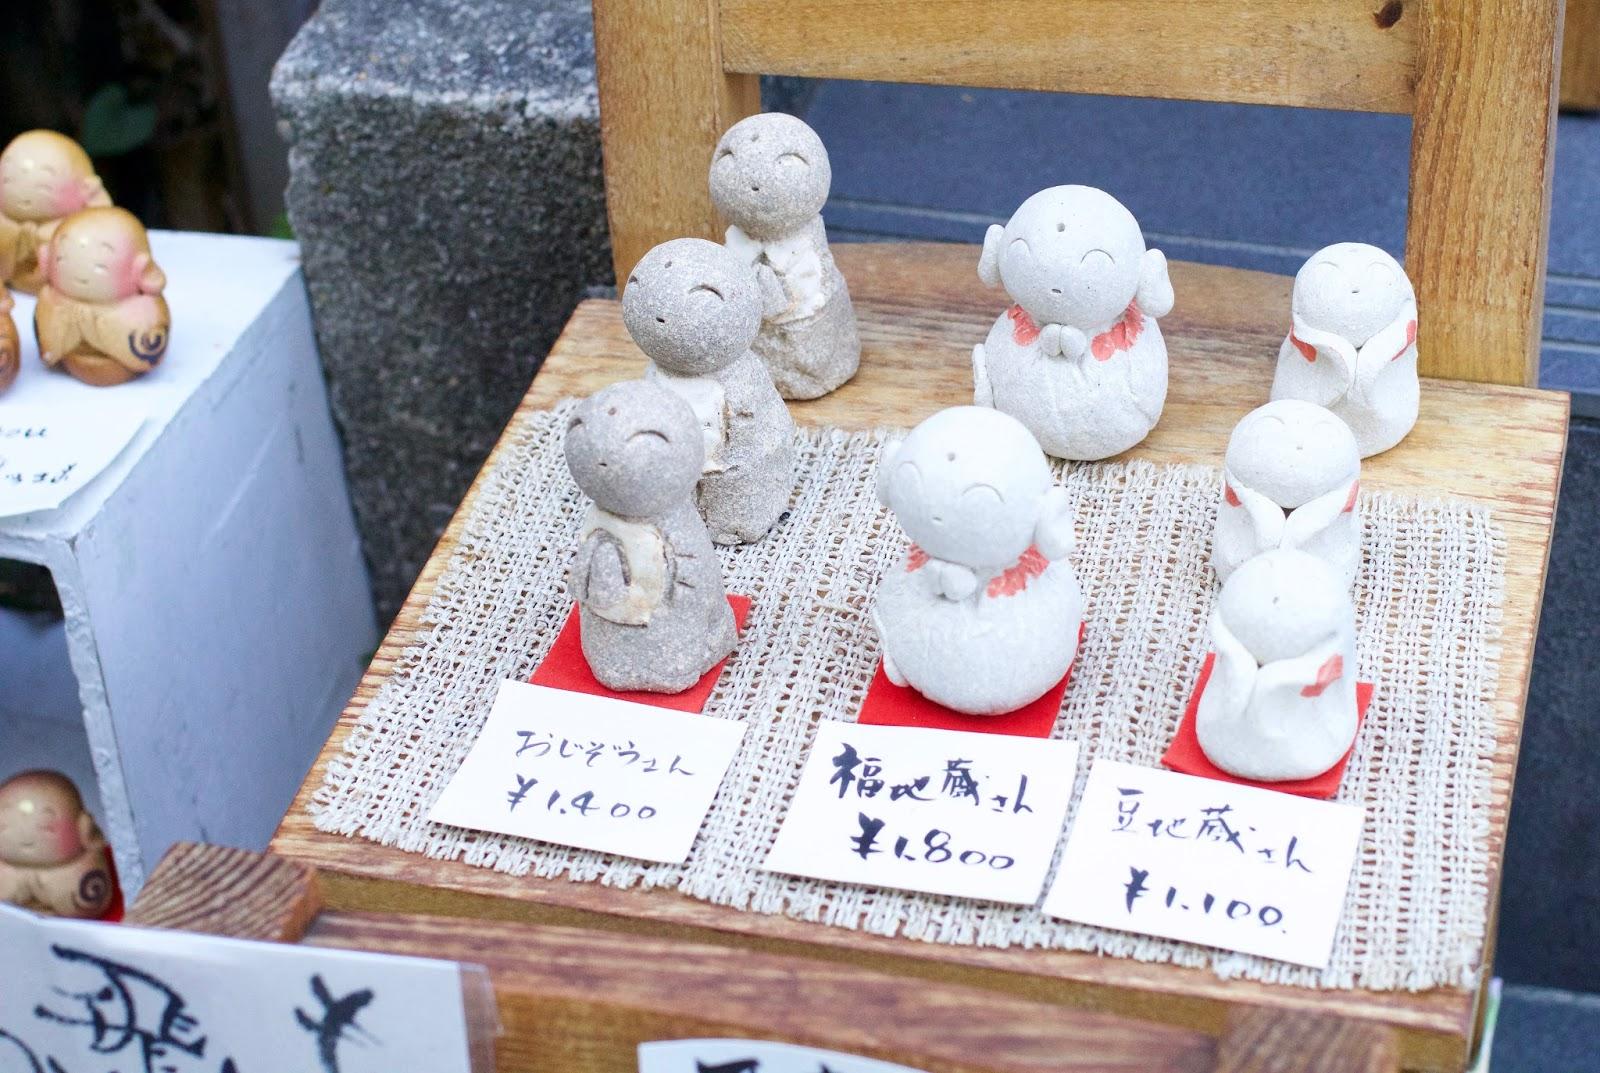 Souvenirs-Kyoto-Japan